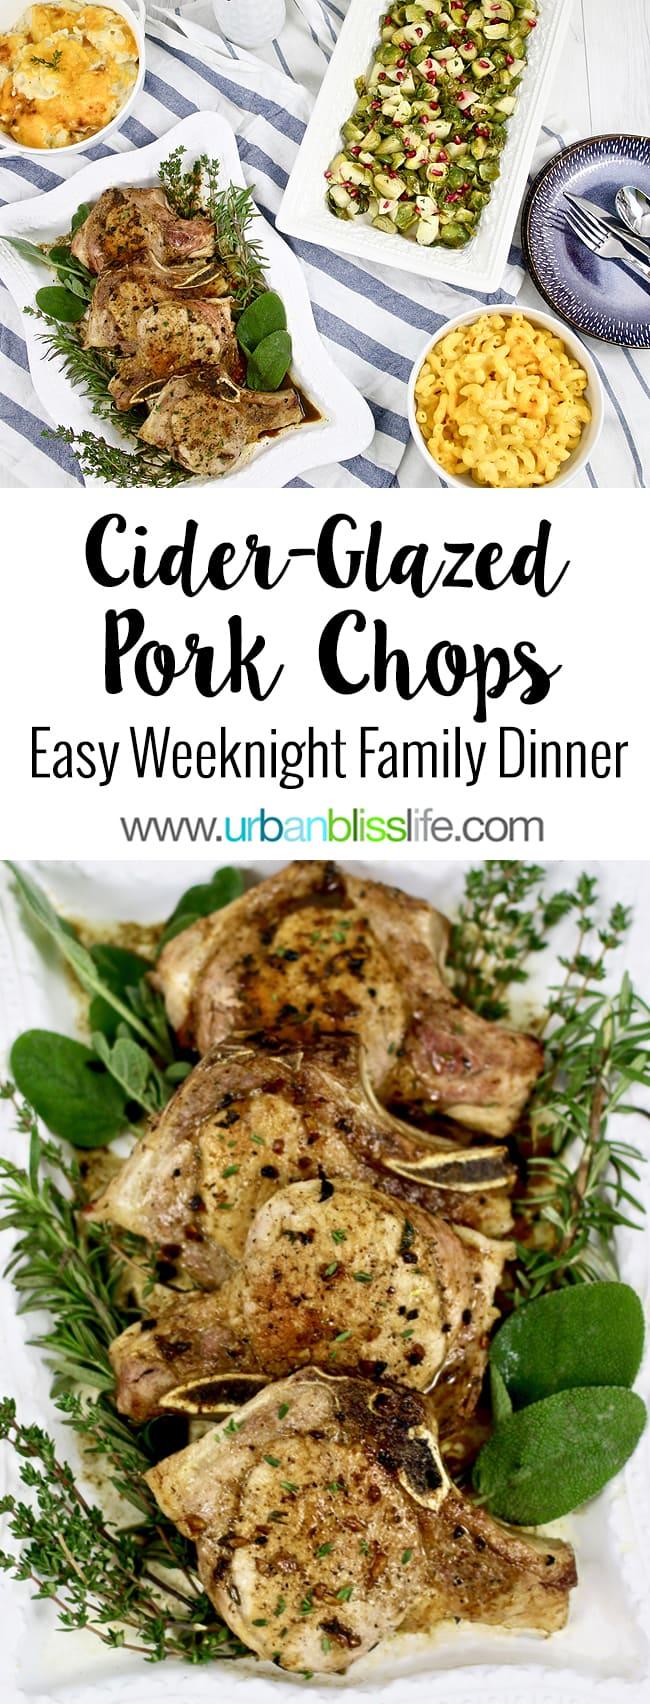 Cider-glazed pork chops recipe on UrbanBlissLife.com